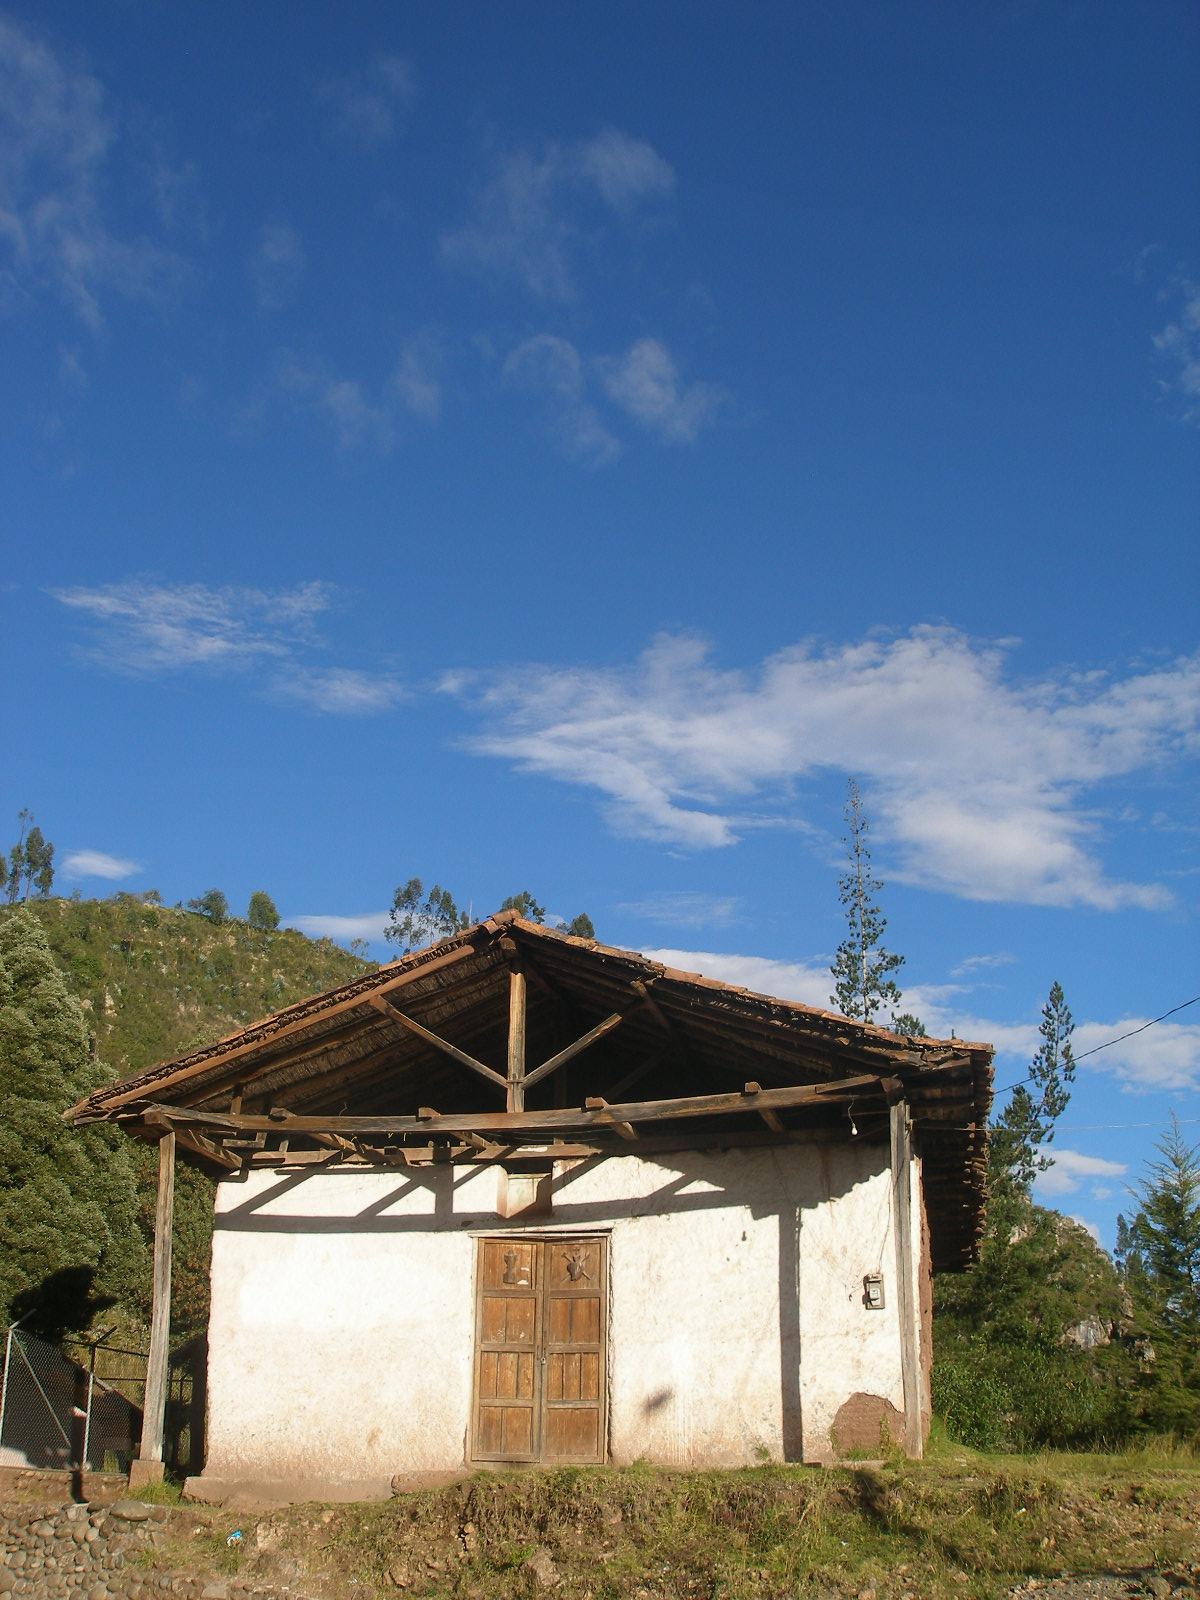 Constructores de casas de adobe en espana - Constructores de casas ...